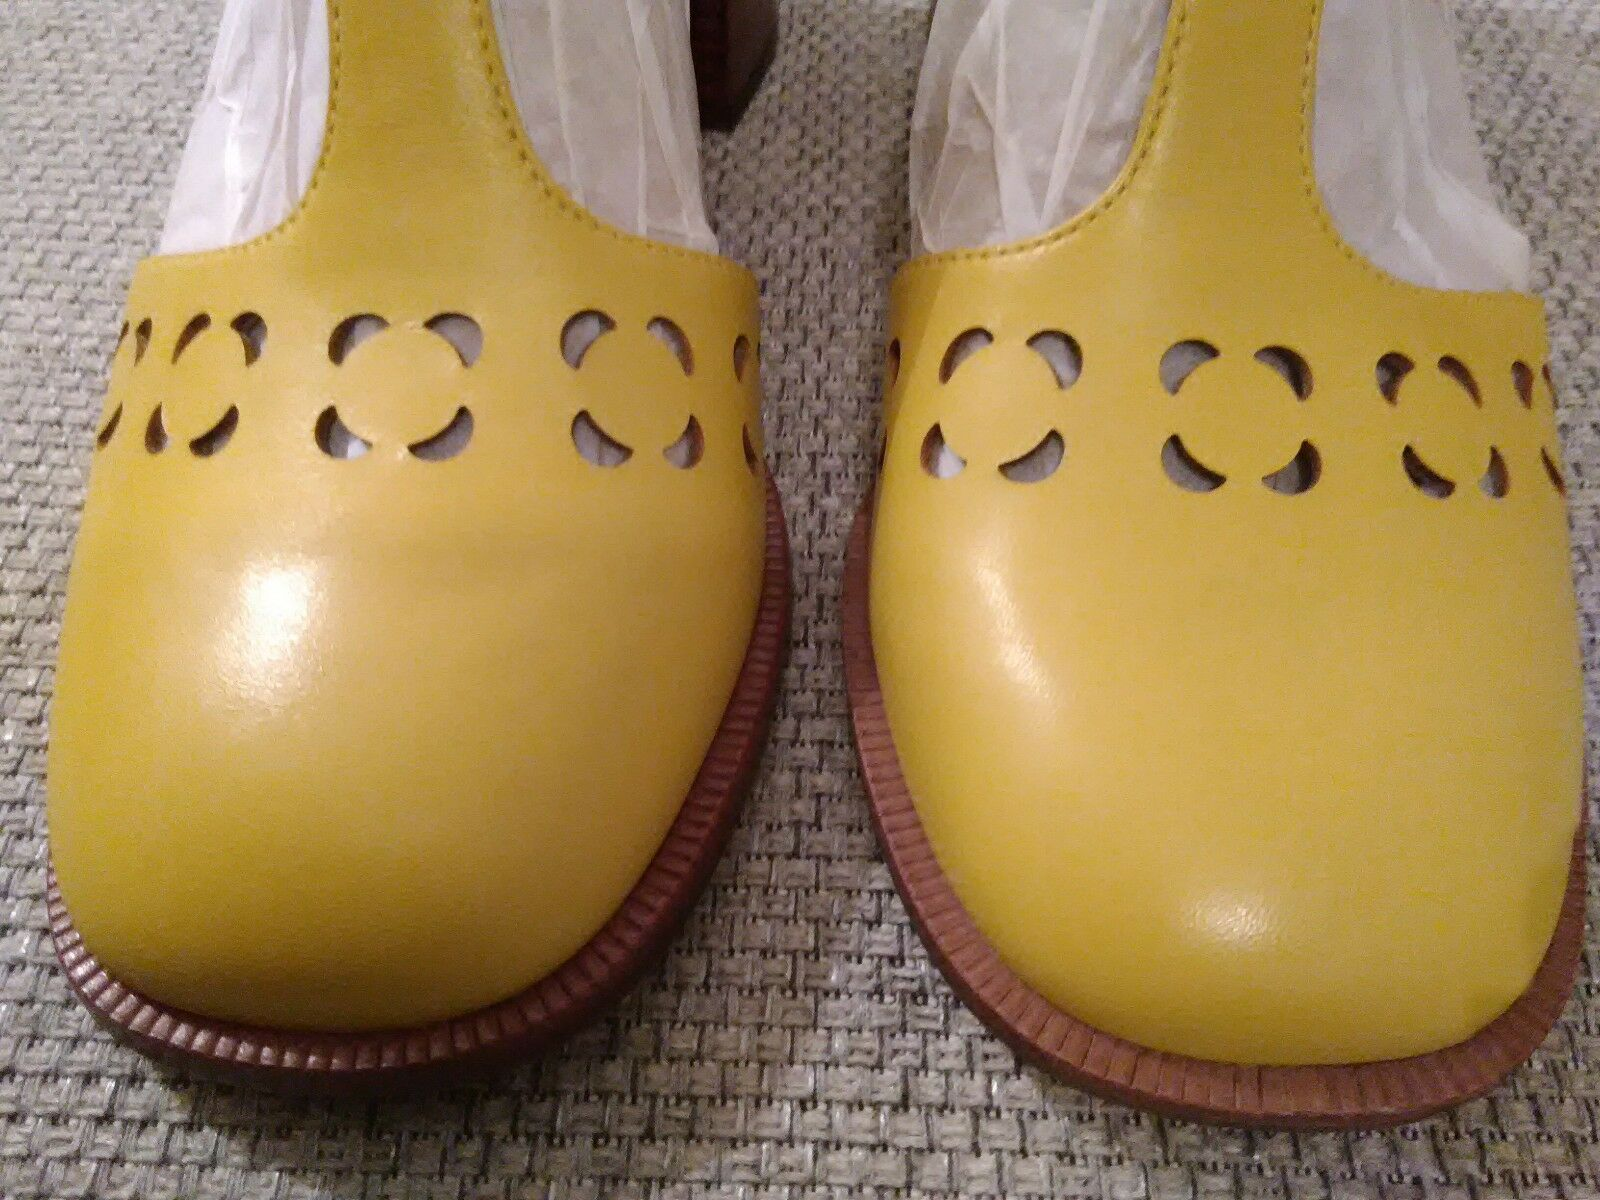 Orla Kiely Clarks Zapatos, Bibi, en en en amarillo, Uk Talla 8, EUR 42, US 10.5, Retro  distribución global